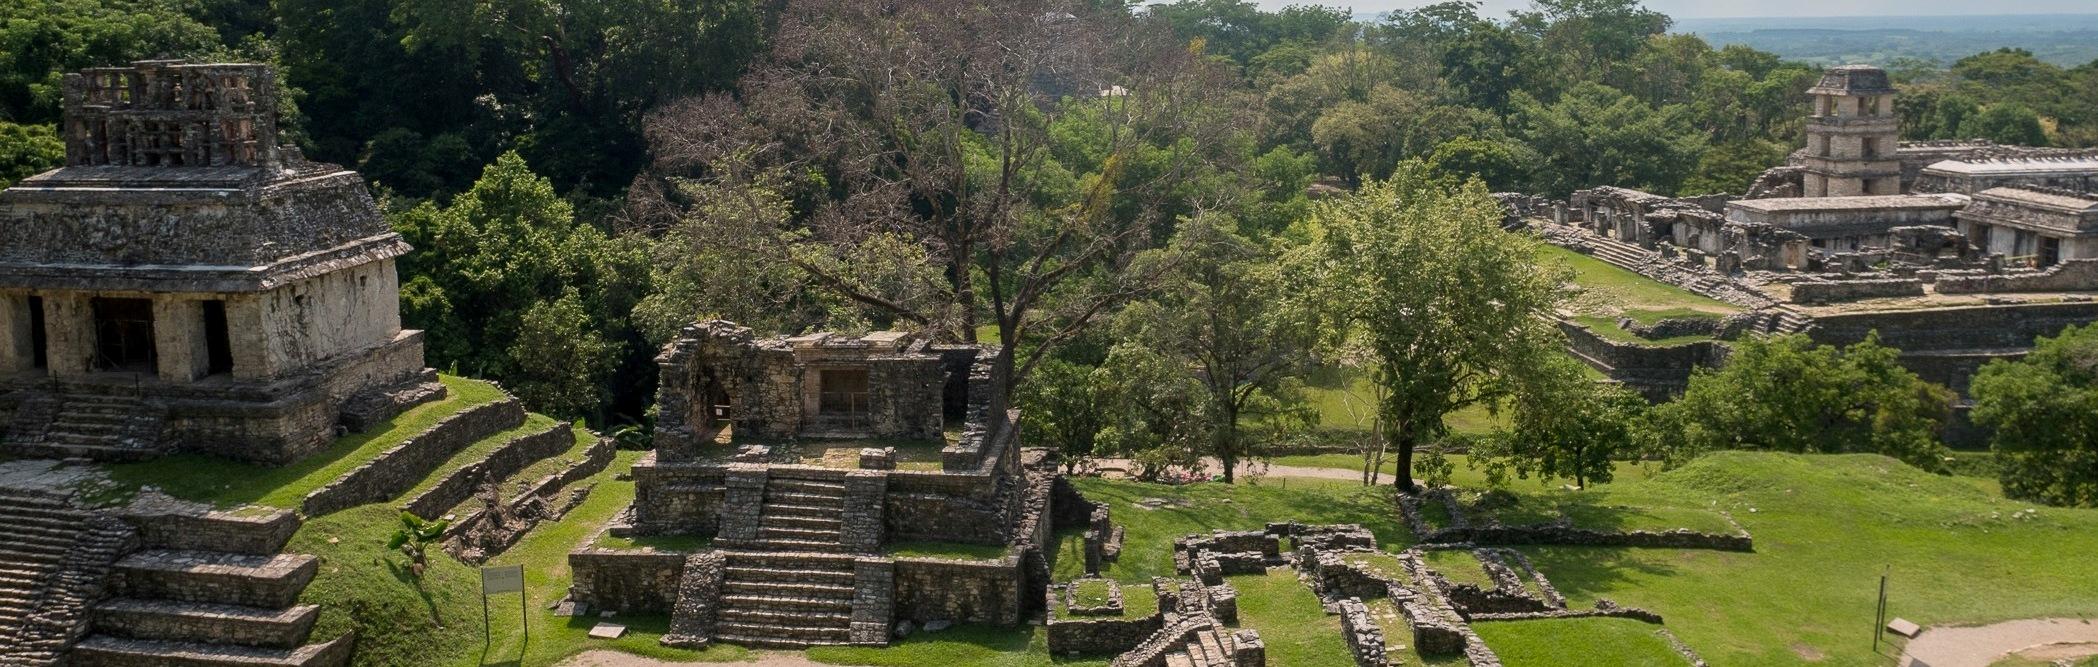 Palenque ruiny (9 of 1) — kopia